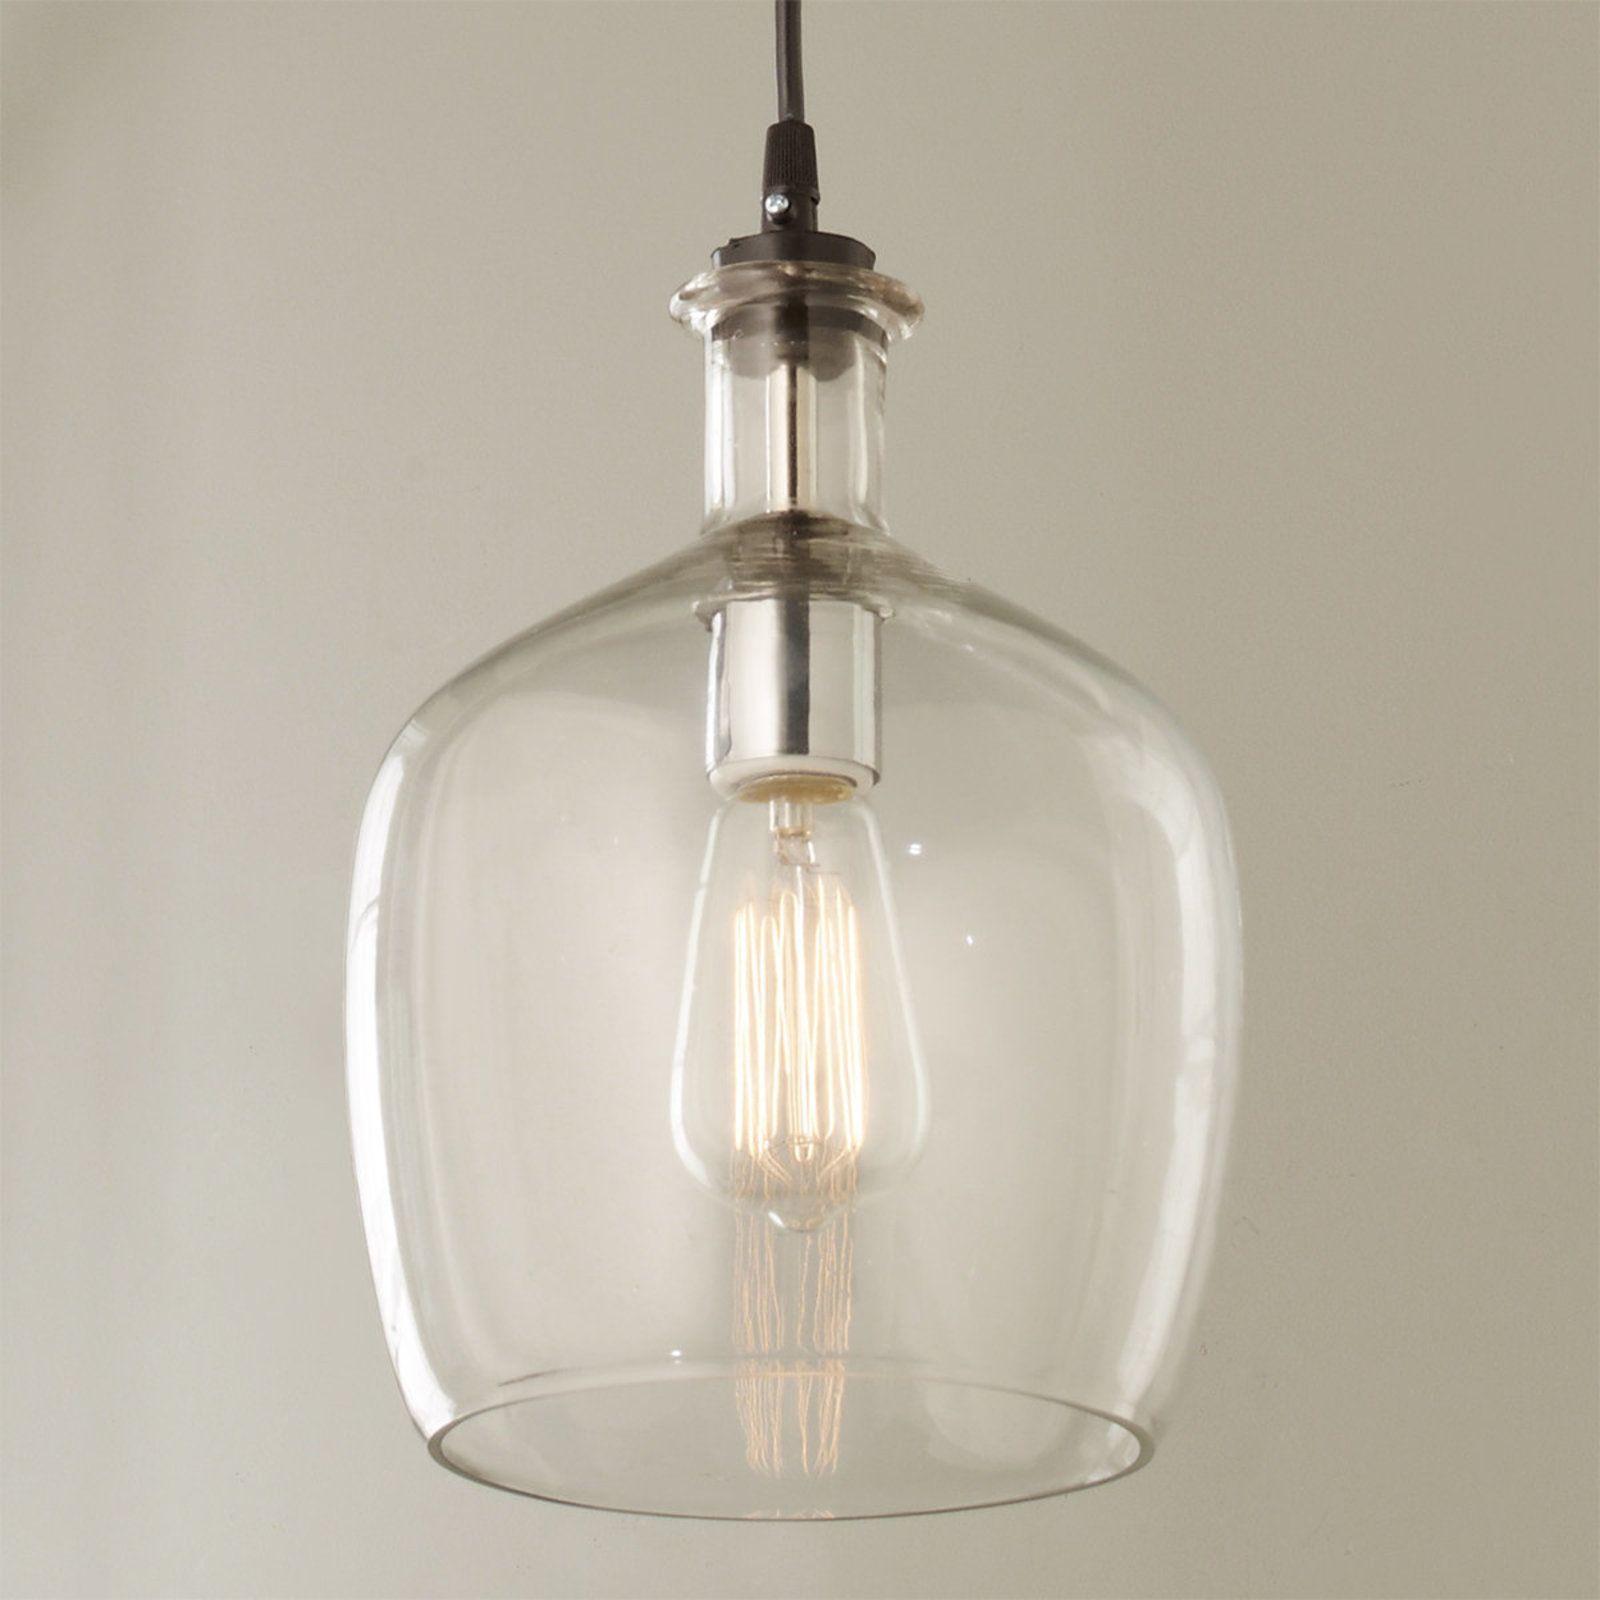 Carafe Gl Pendant Light Small Shades Of